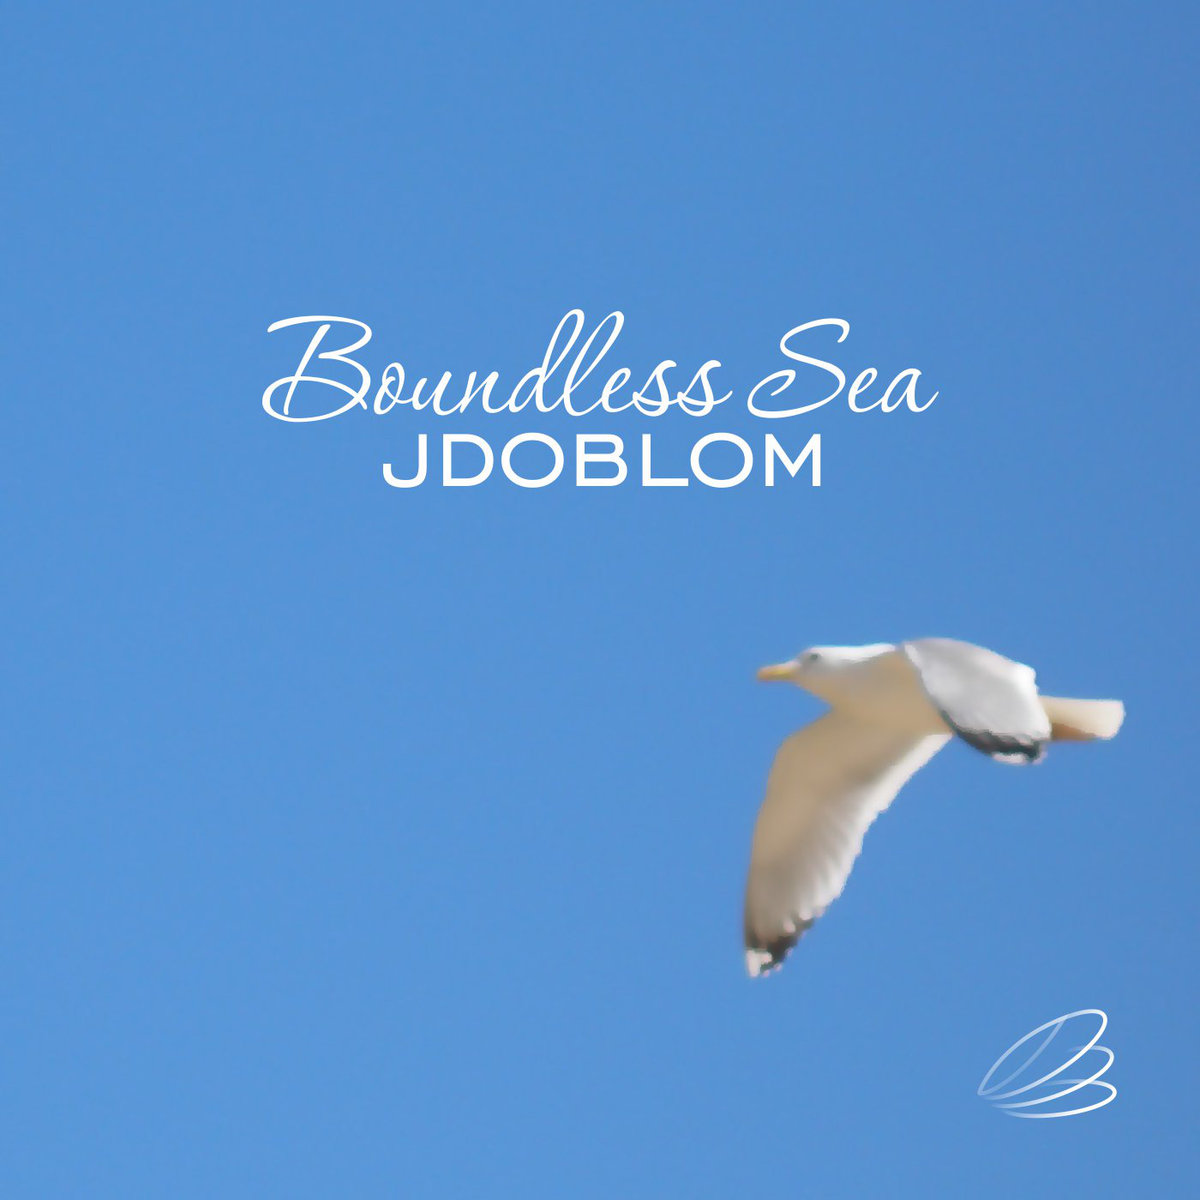 jdoblom - Boundless Sea